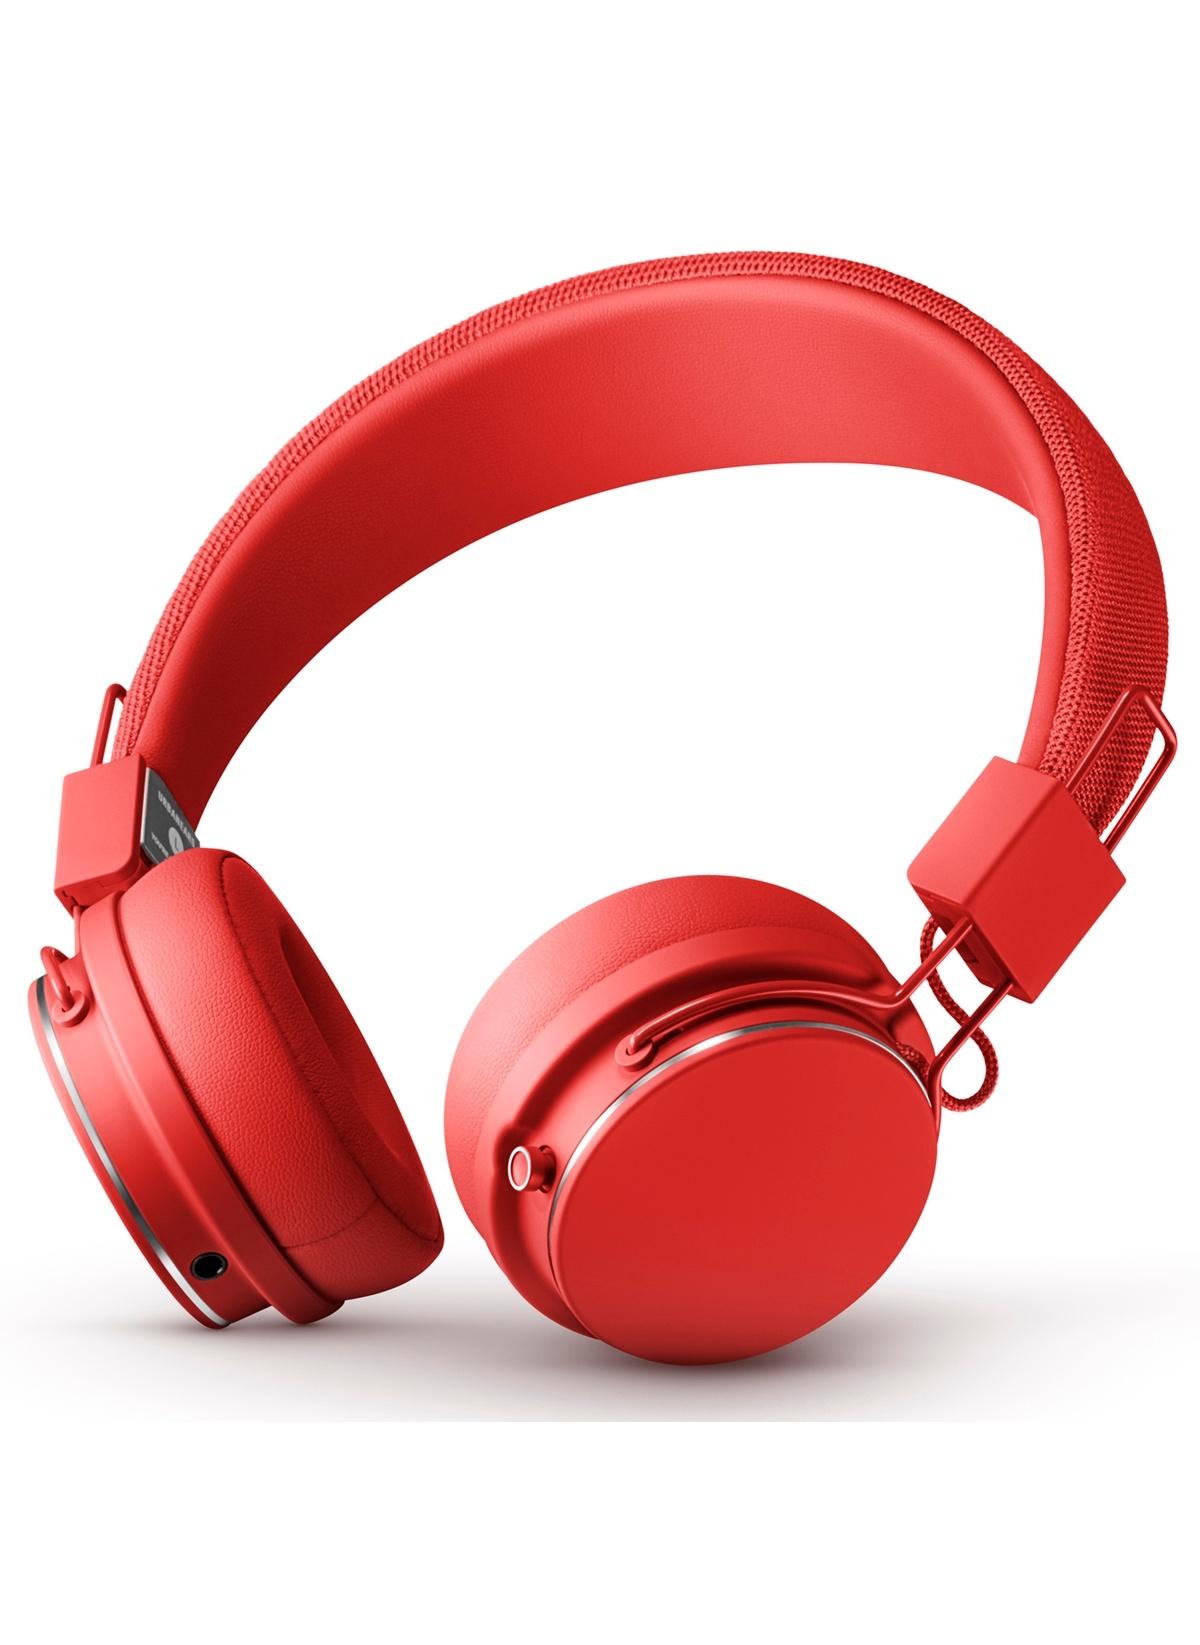 Standart Urbanears Plattan 2 Bluetooth Kırmızı Mikrofonlu Kulak Üstü Kulaklık